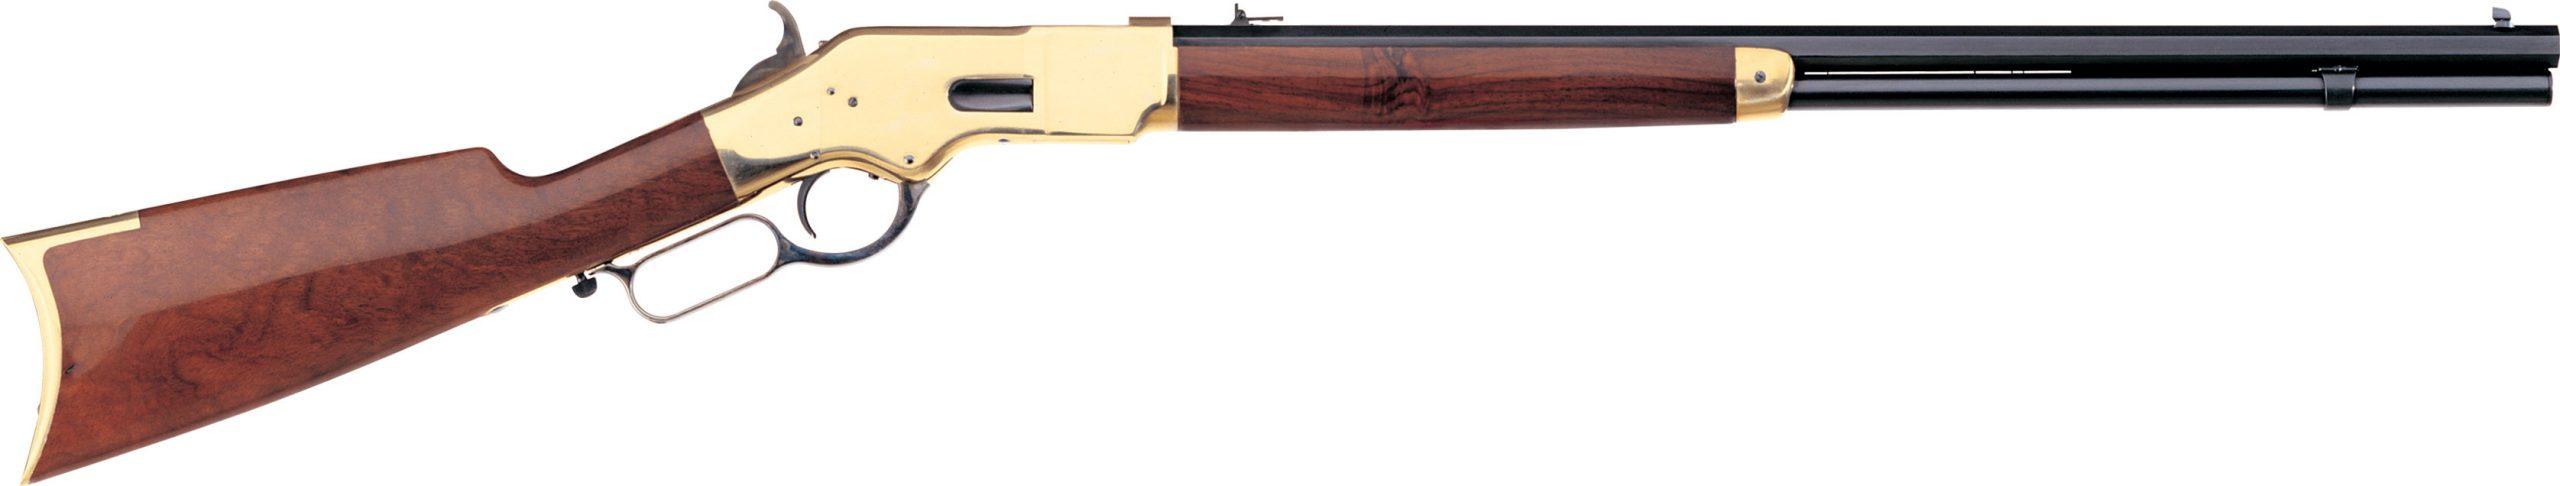 Rifle UBERTI, modelo YELLOW BOY, calibres 44/40 y 45 LC-0